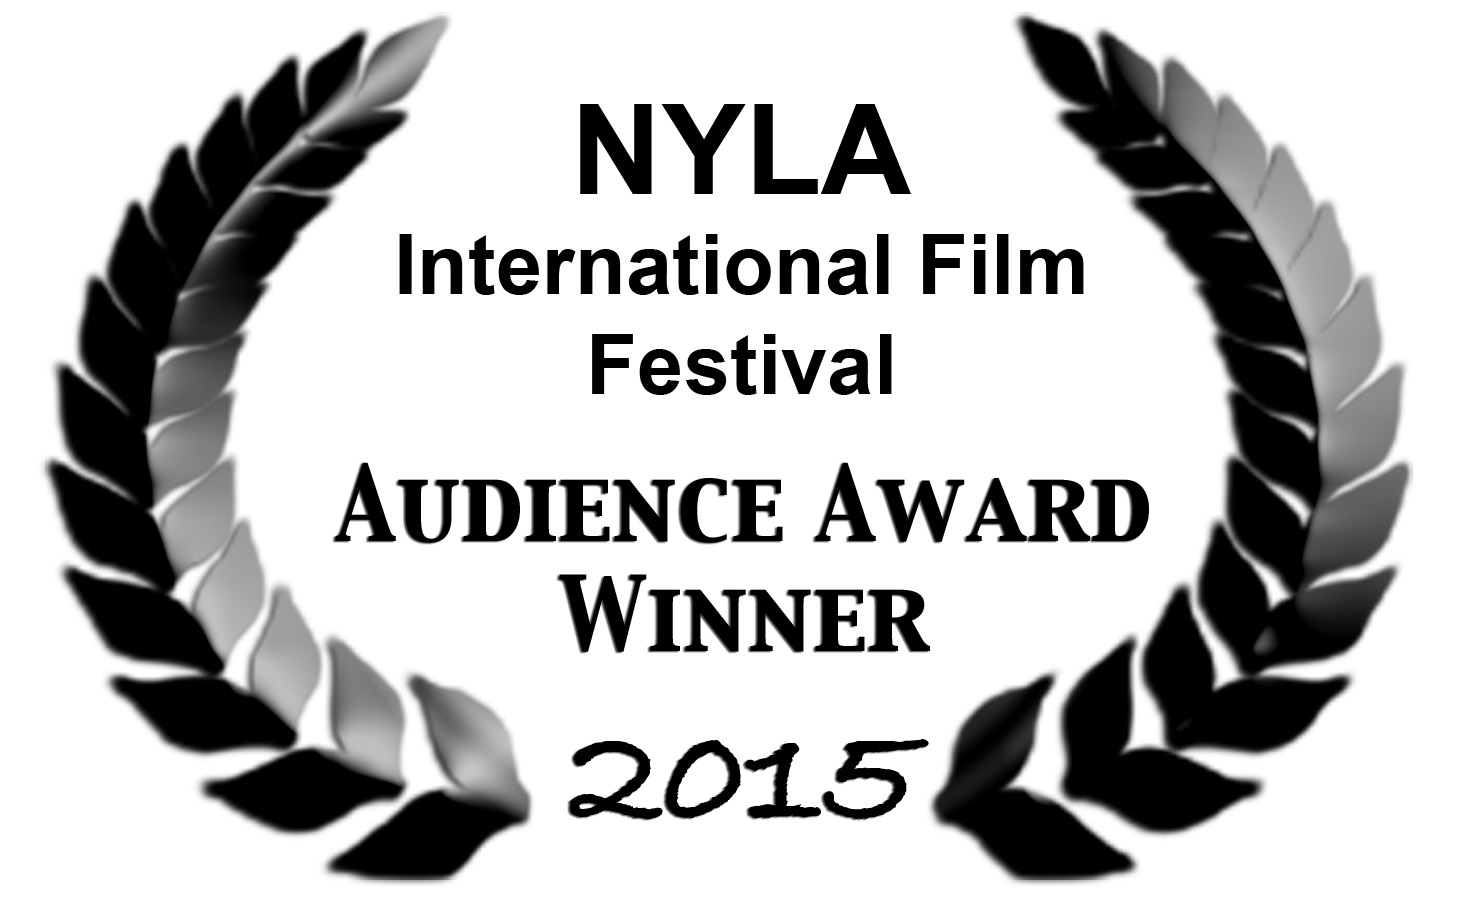 NYLA festival laurel Audience Award.jpg